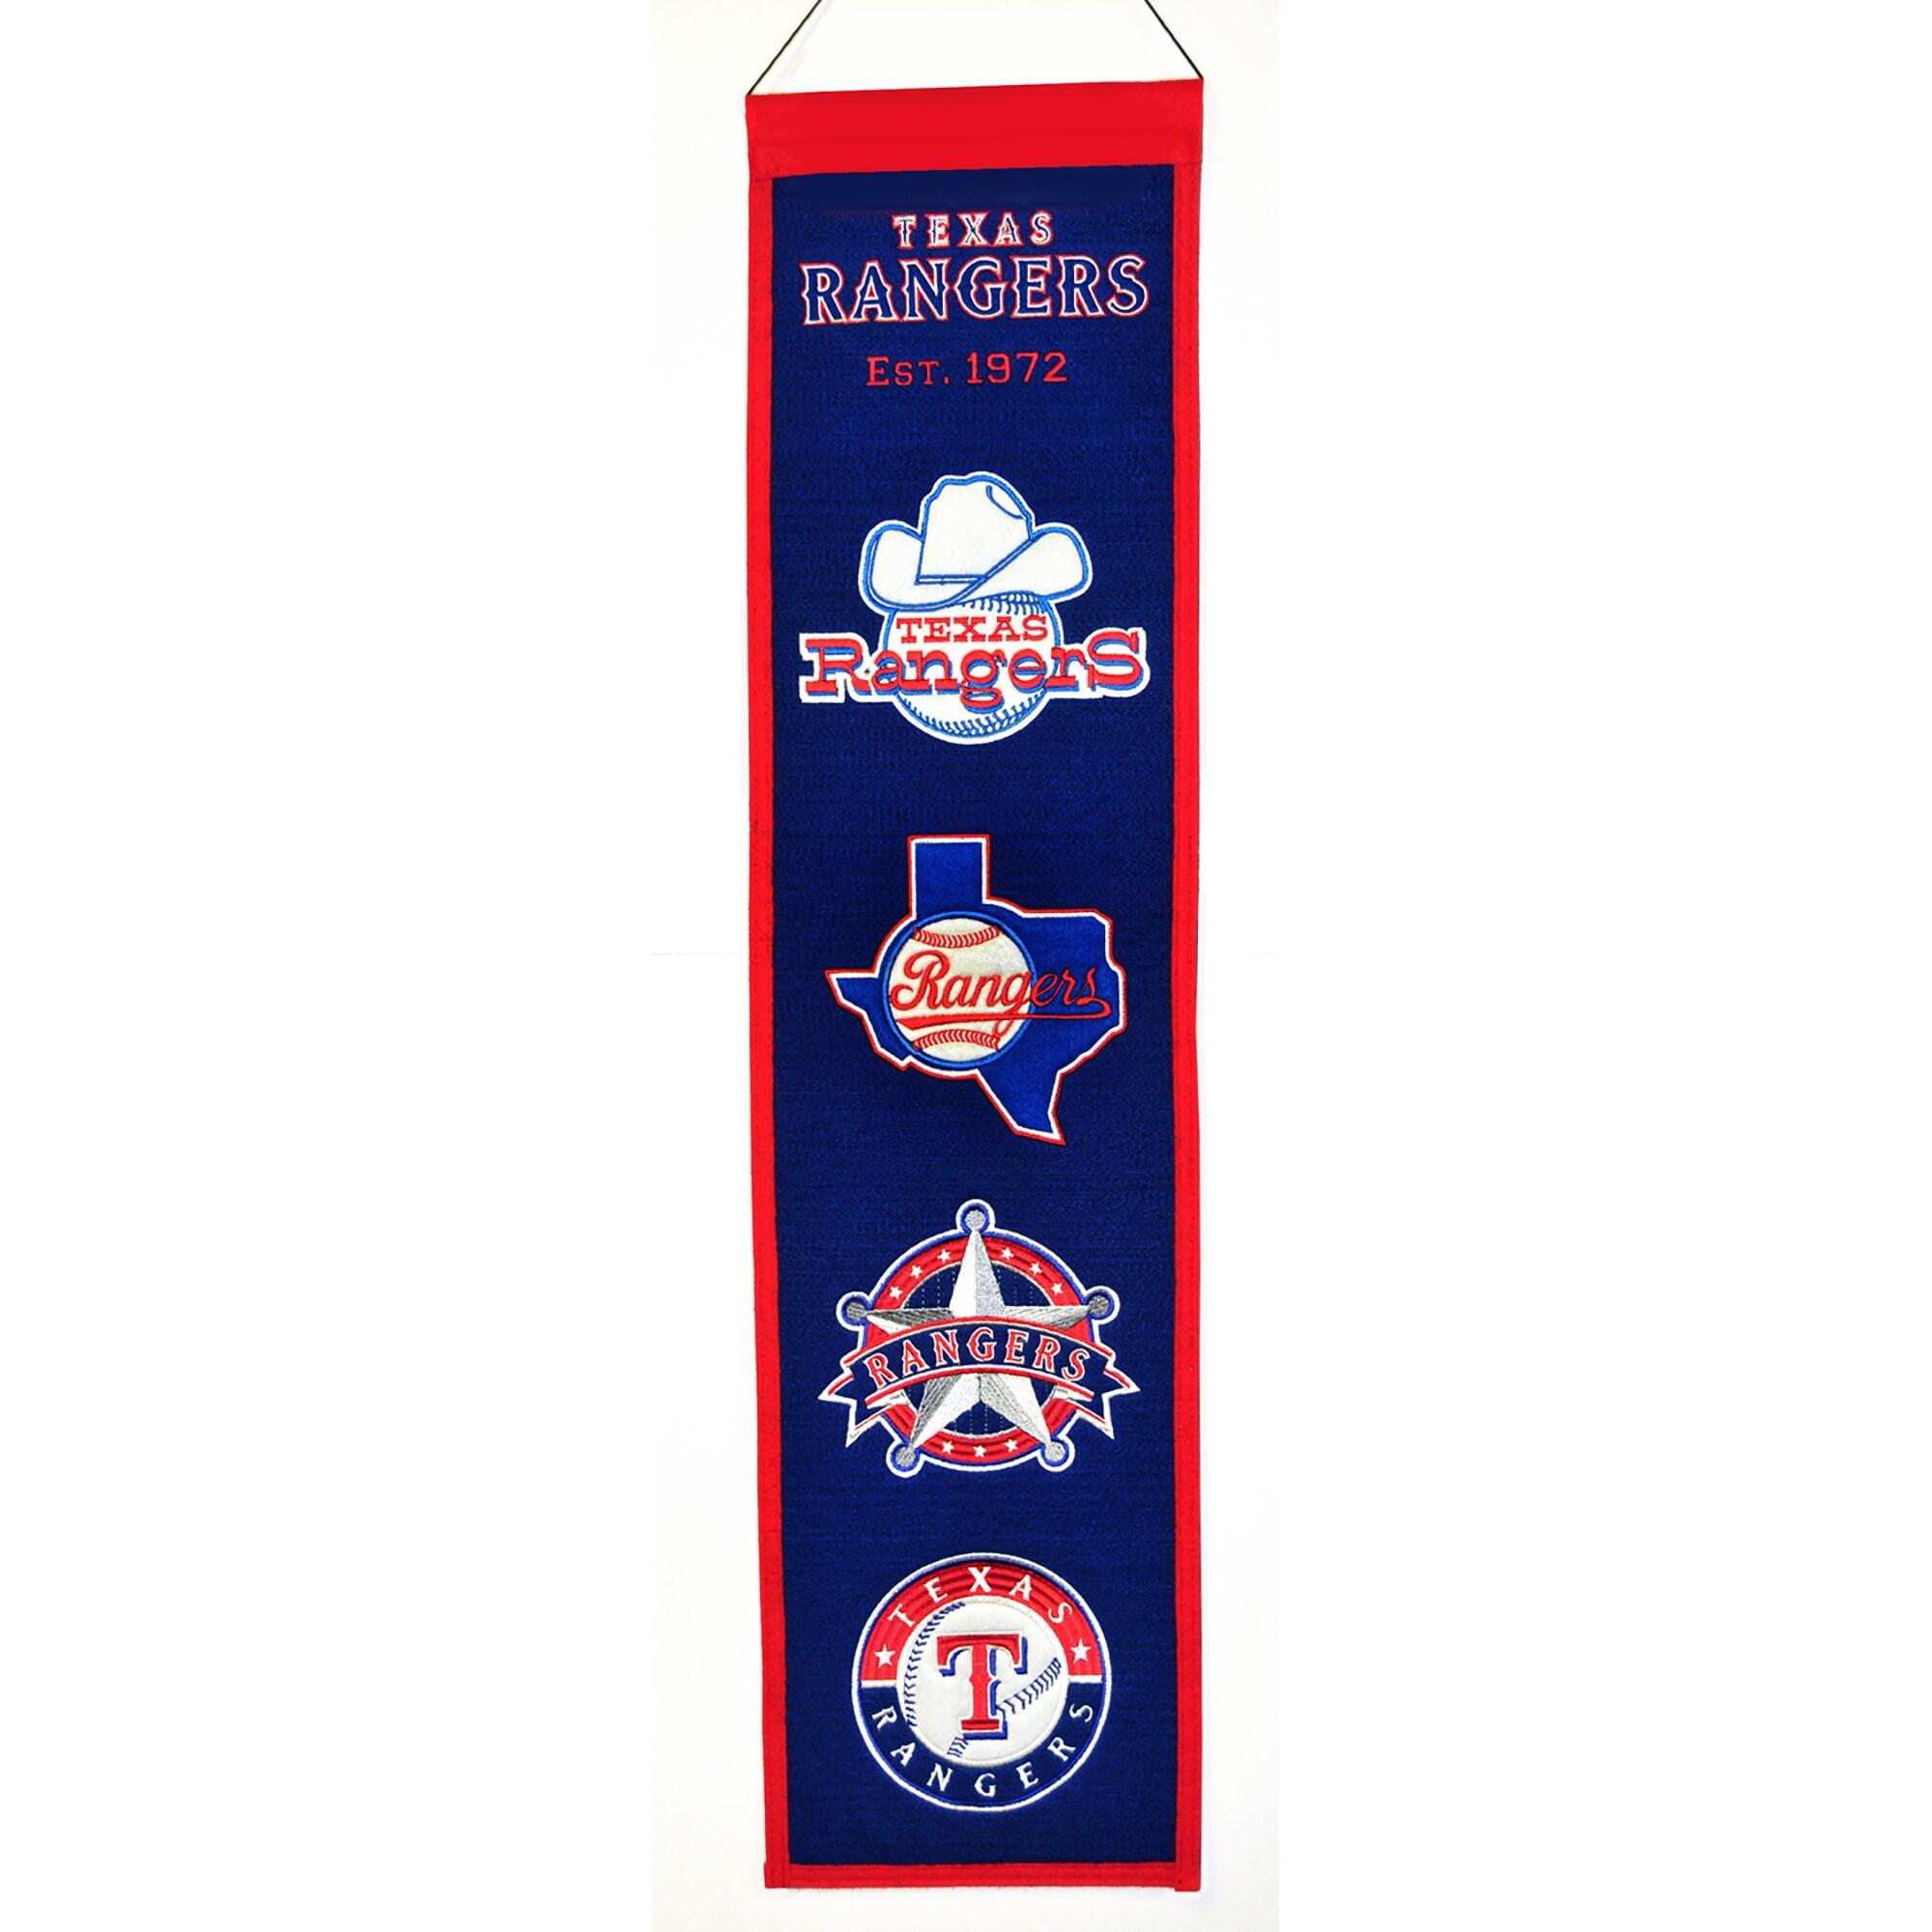 "Texas Rangers 8"" x 32"" Heritage Banner"